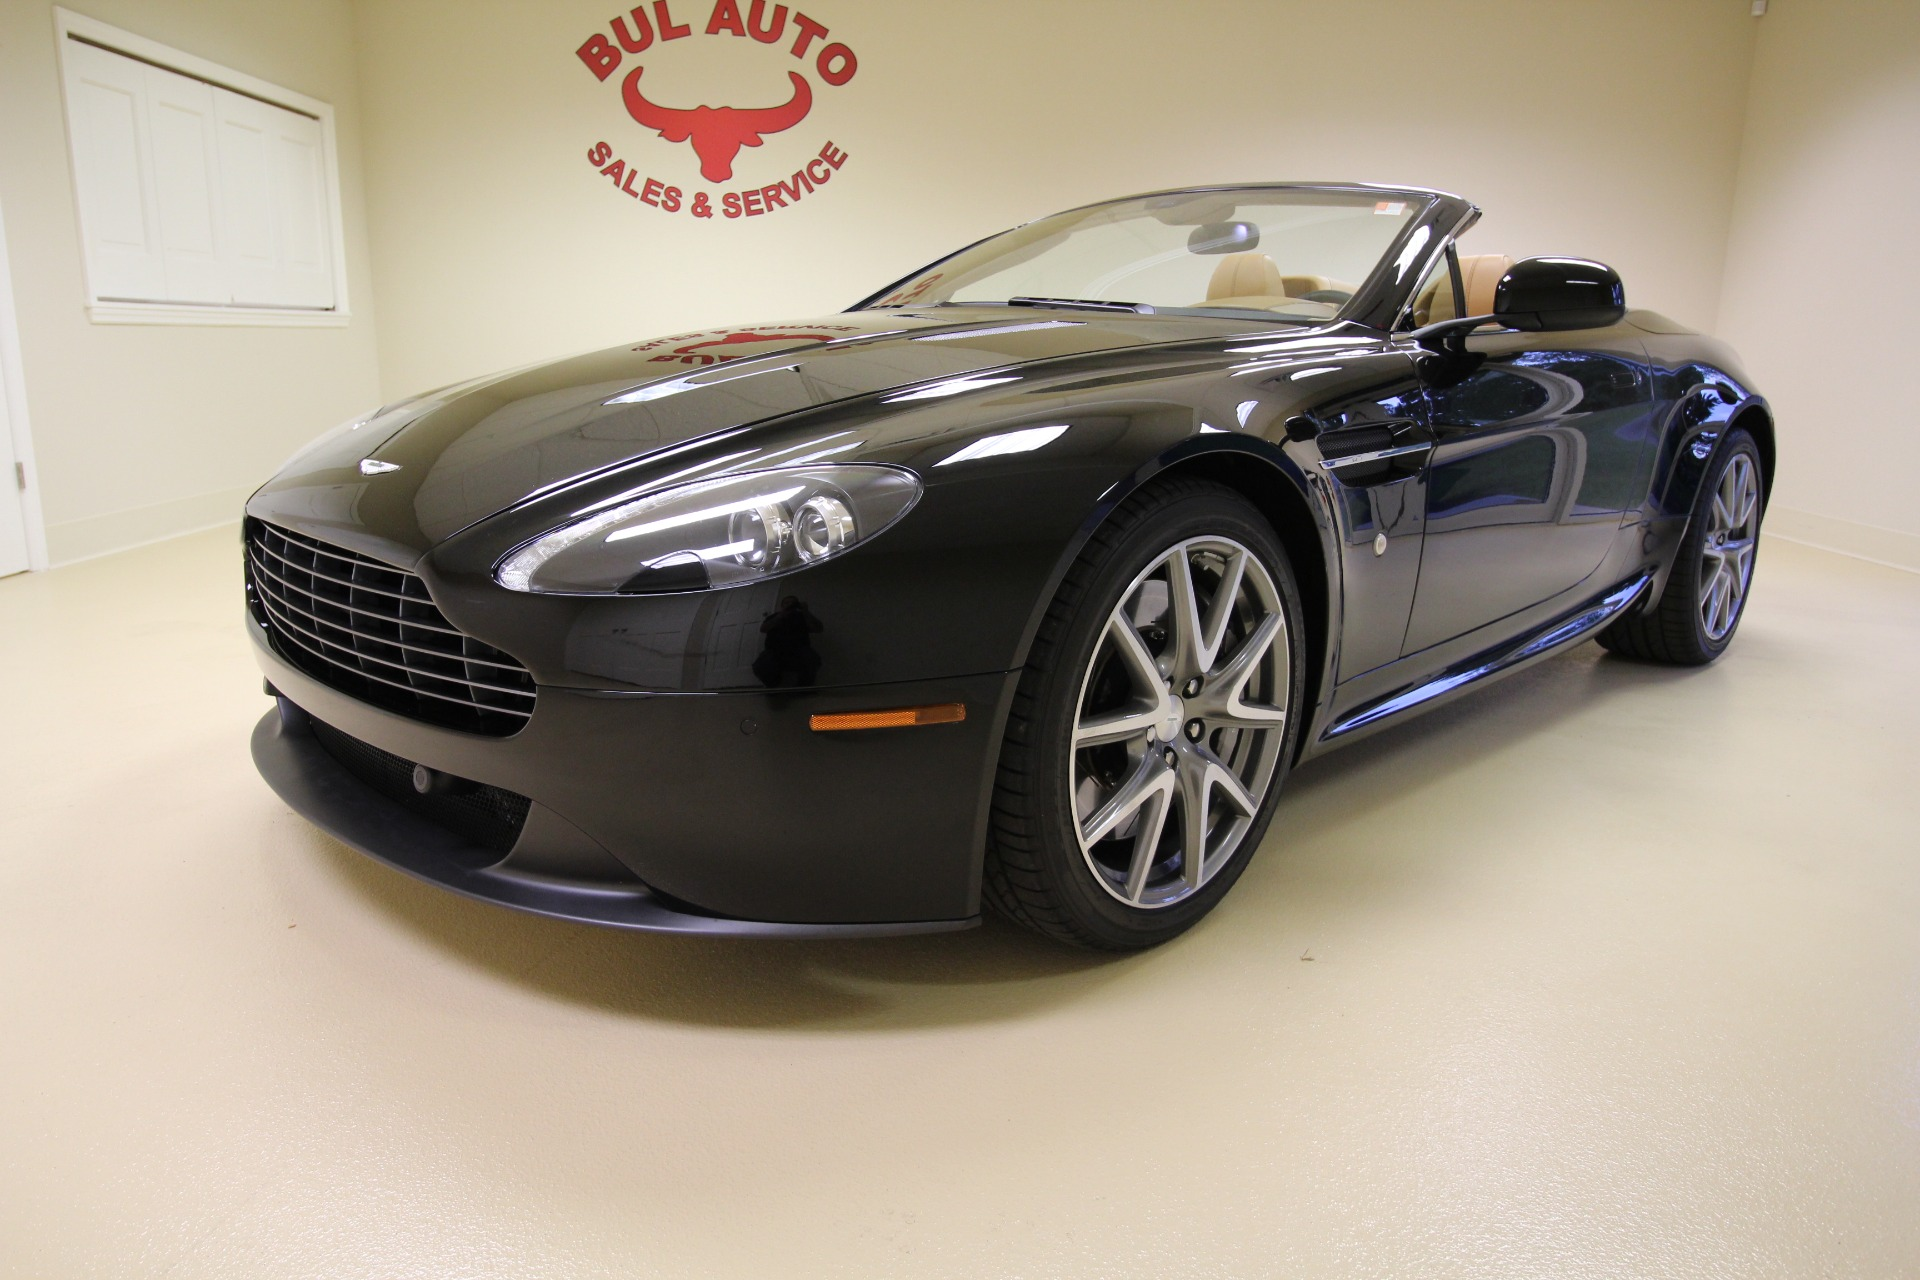 2013 Aston Martin V8 Vantage Roadster Stock # 18032 for sale near ...